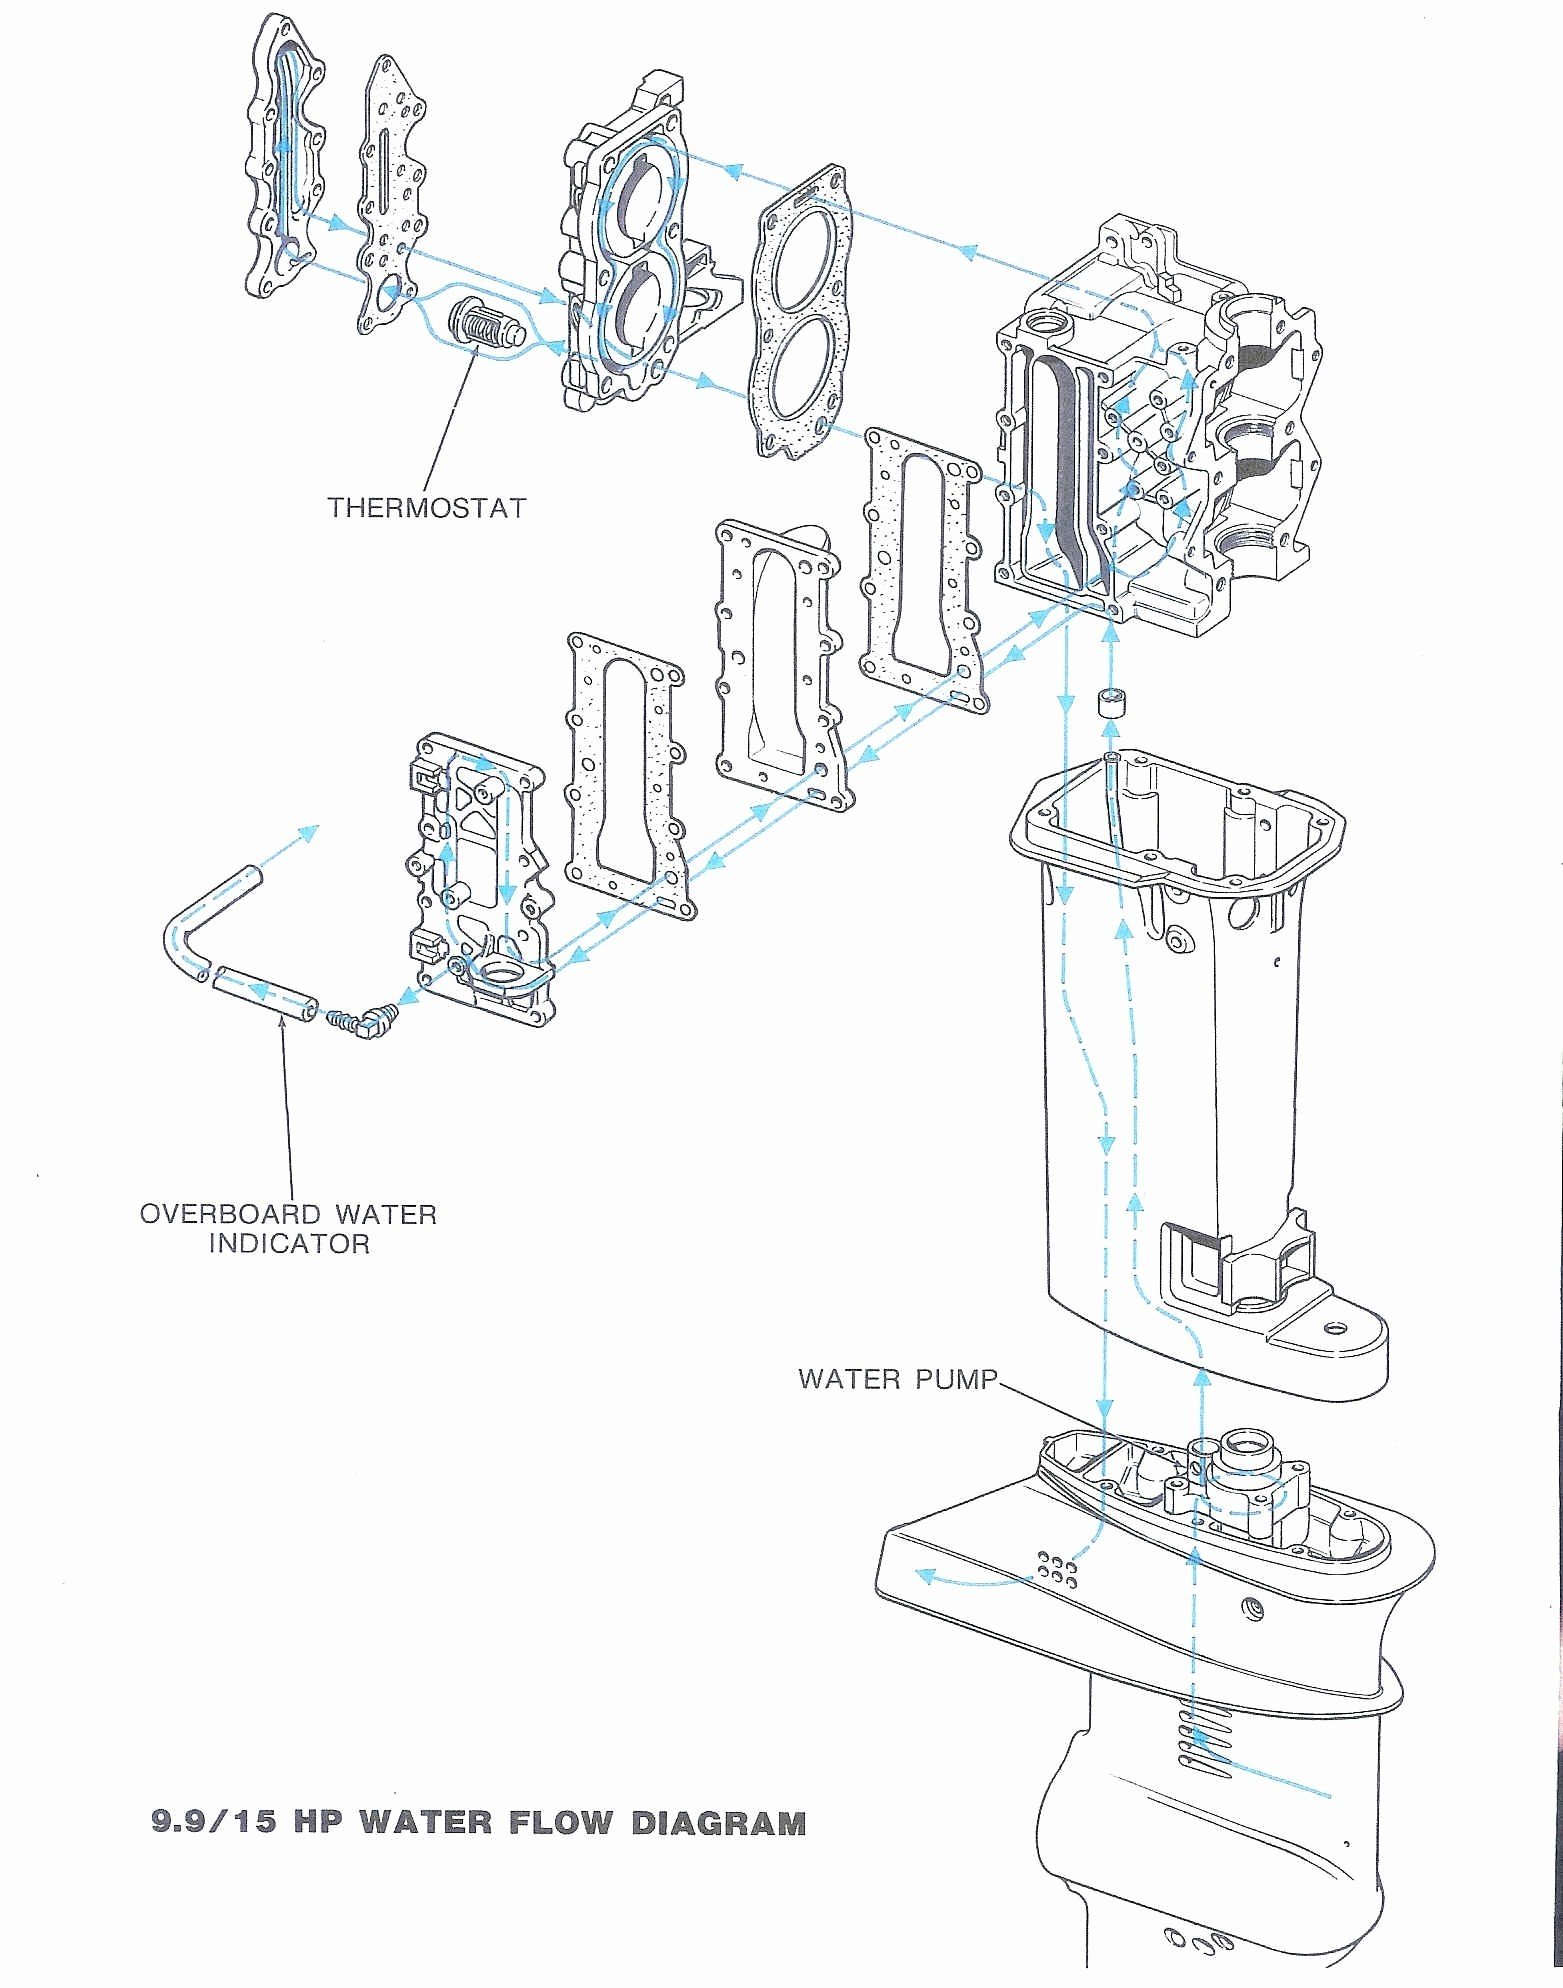 2 Cycle Engine Carburetor Diagram 2 Stroke Engine Diagram Of 2 Cycle Engine Carburetor Diagram